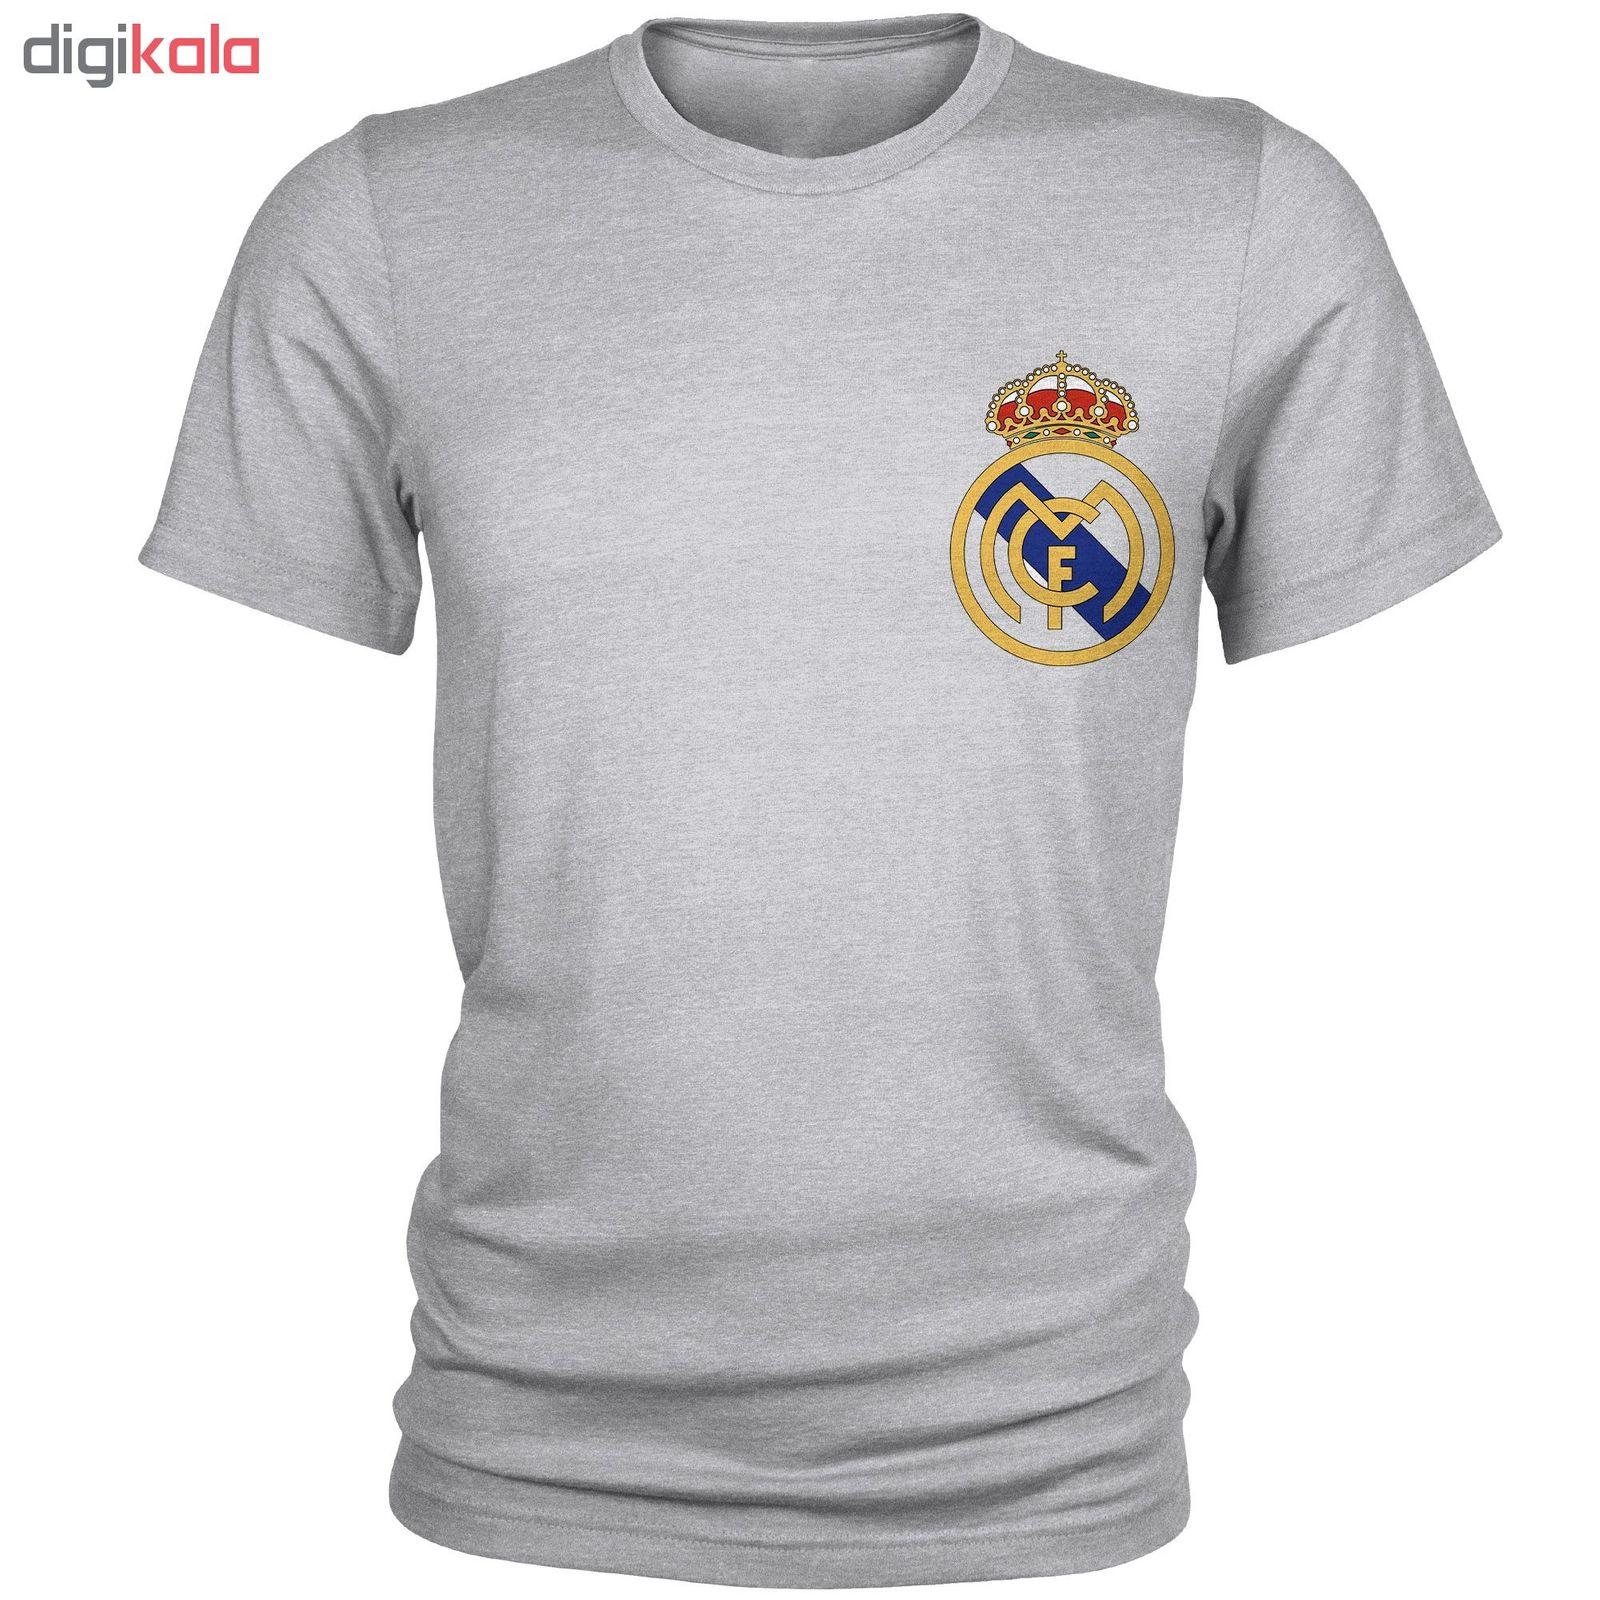 تی شرت مردانه طرح رئال مادرید کد S666 main 1 1